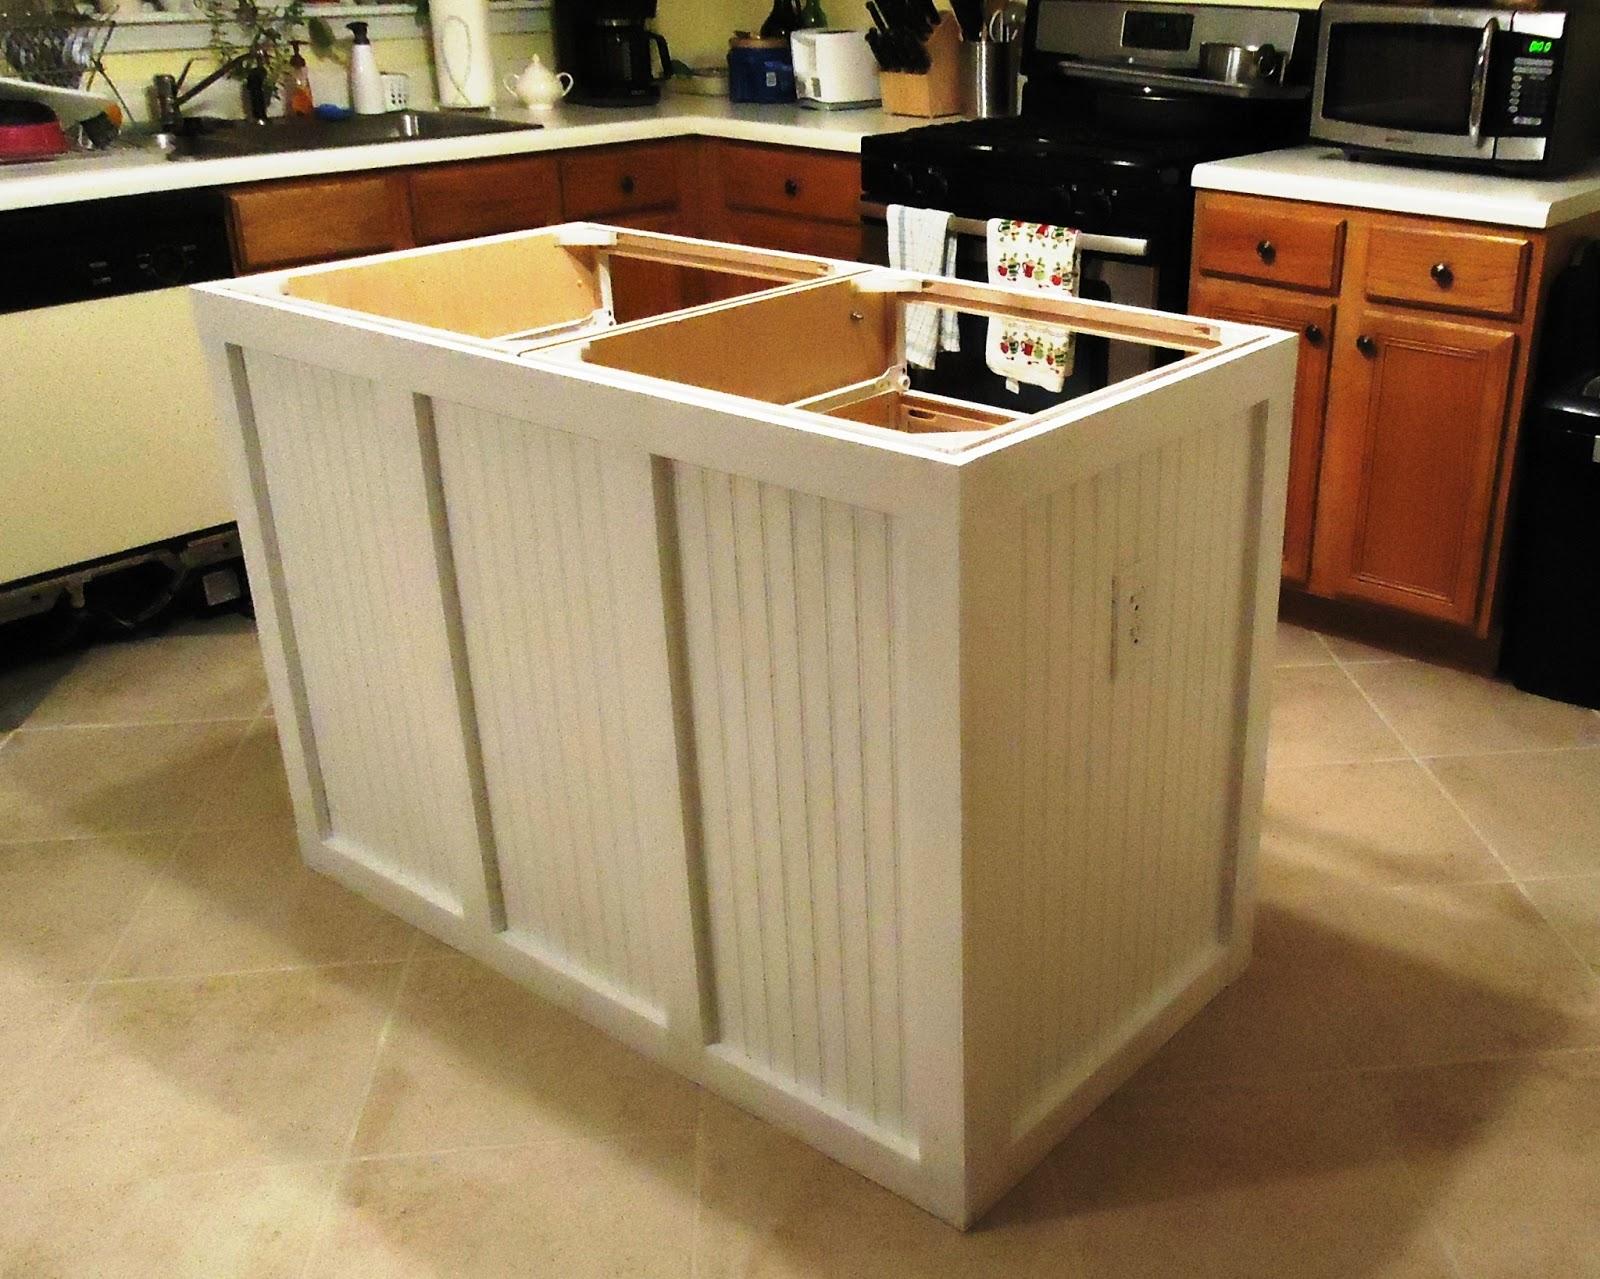 Diy Kitchen Island Ikea Cabinets Printable Worksheets And